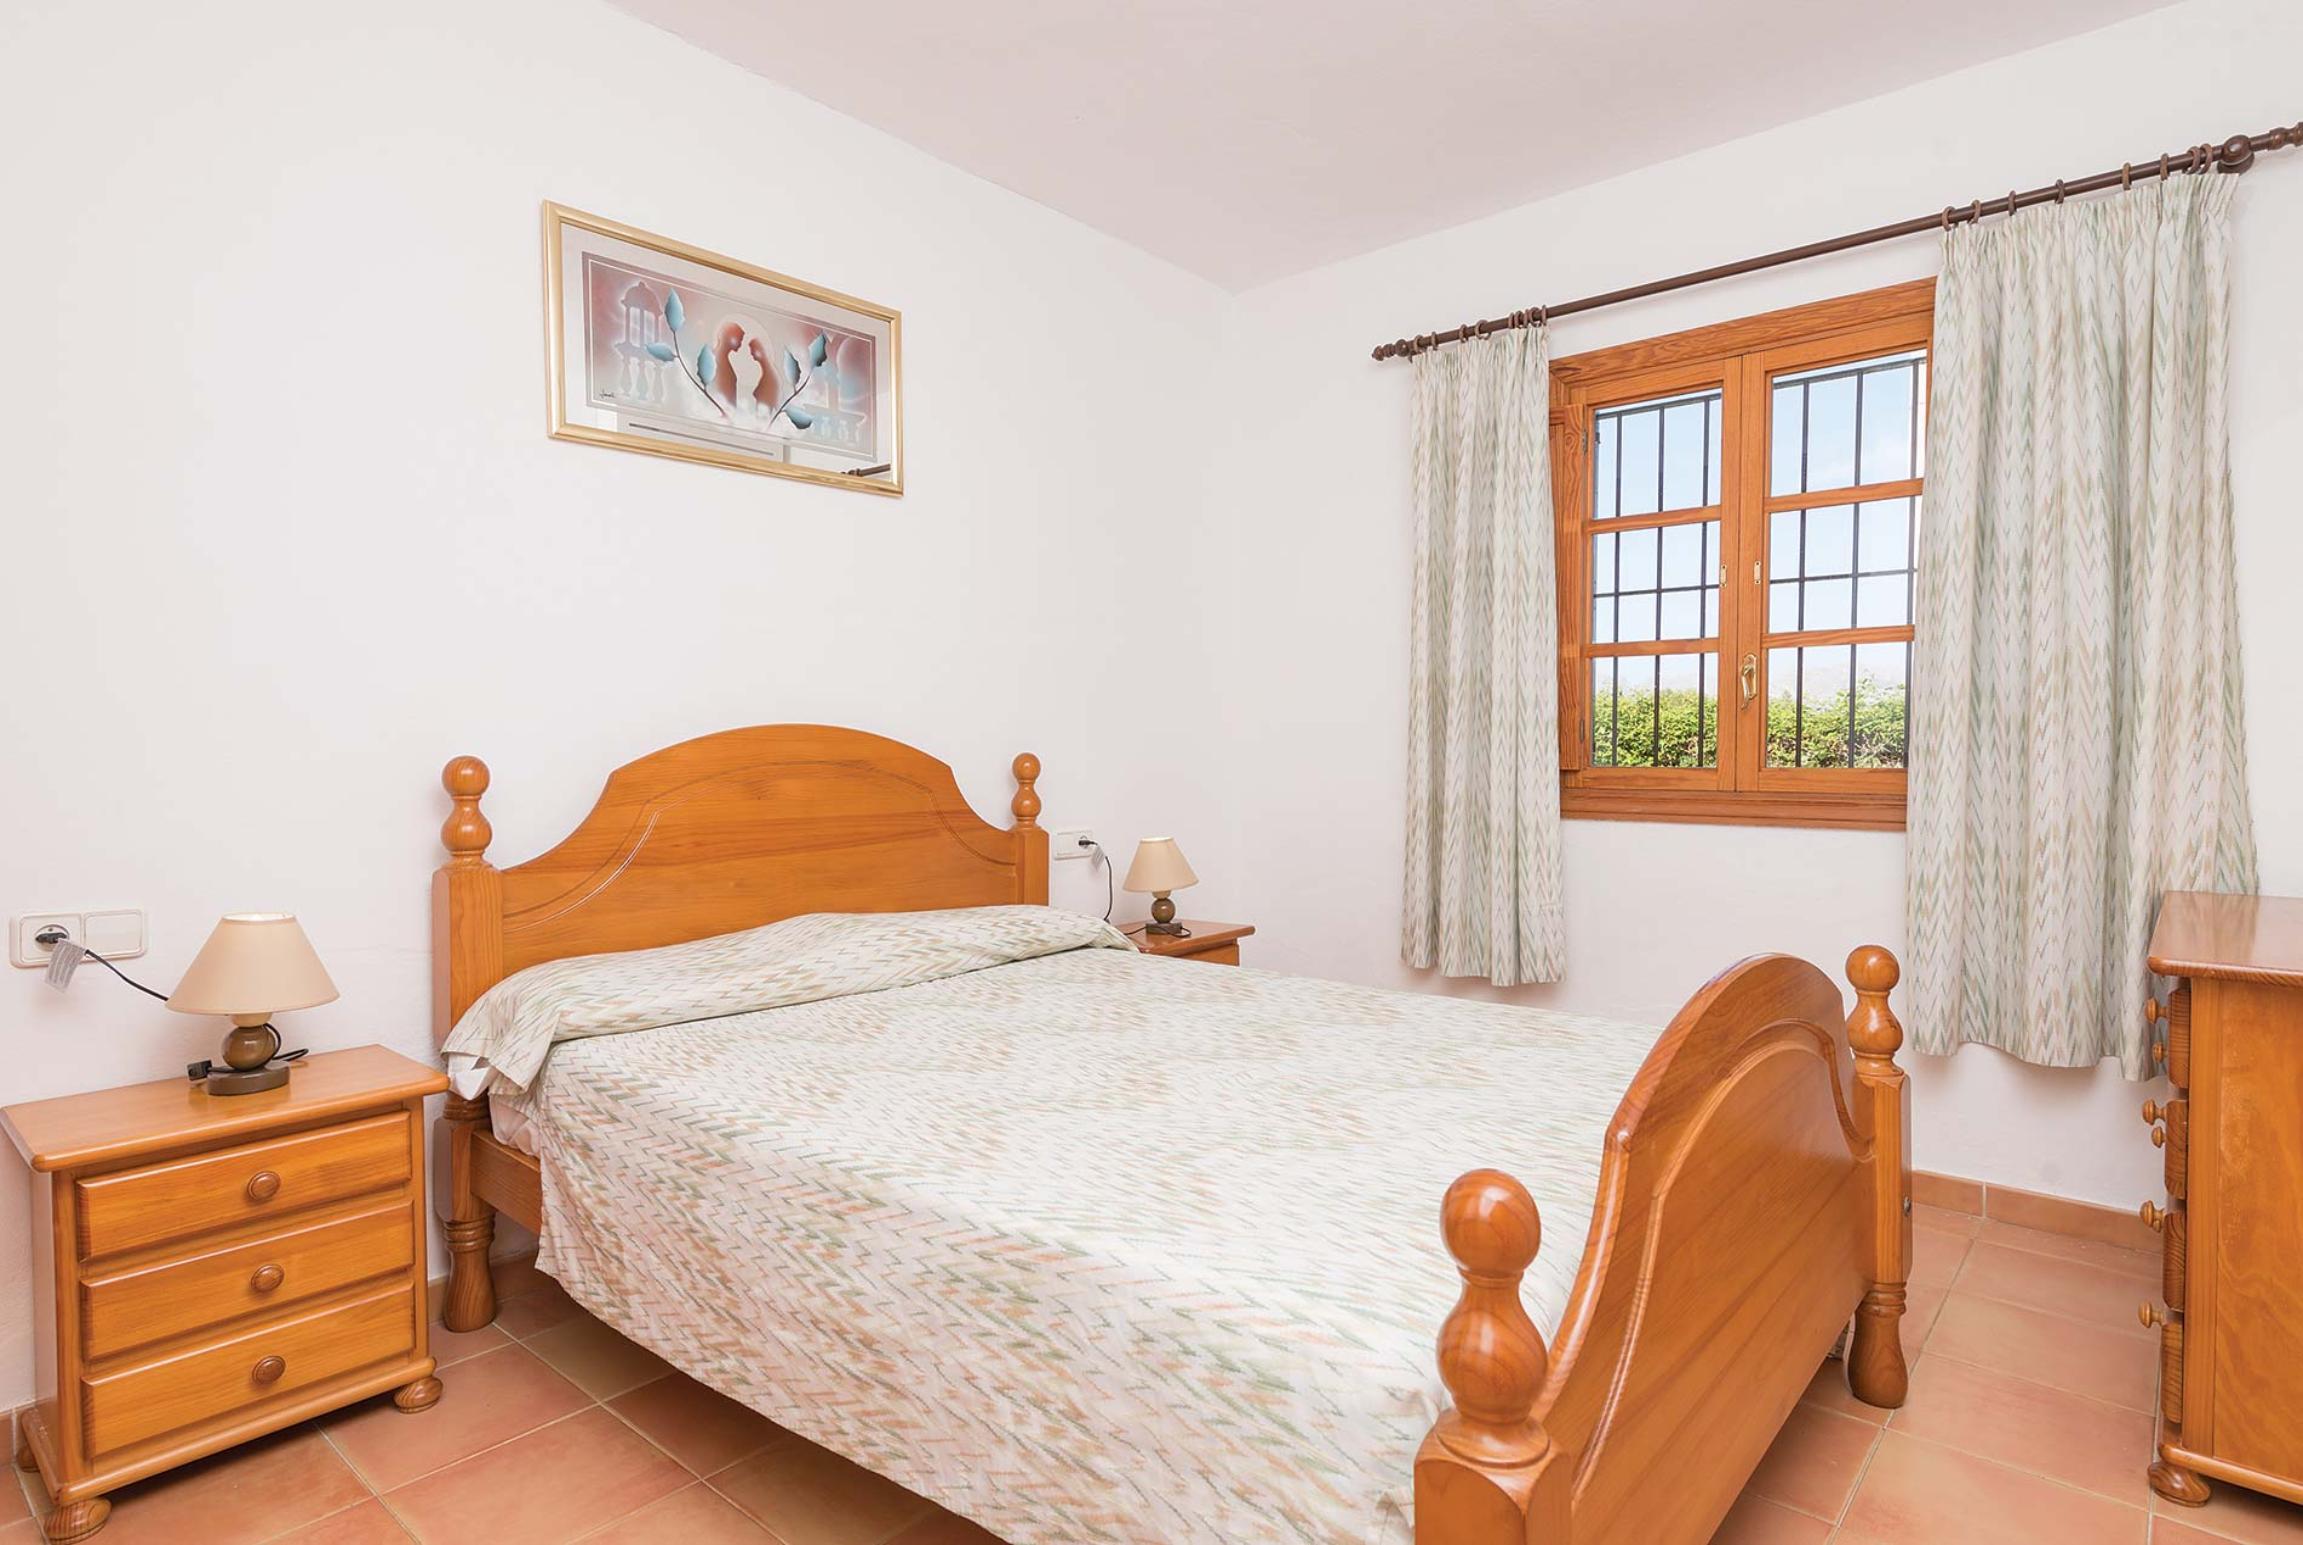 Ferienhaus Rasca (2654350), Formentor, Mallorca, Balearische Inseln, Spanien, Bild 5